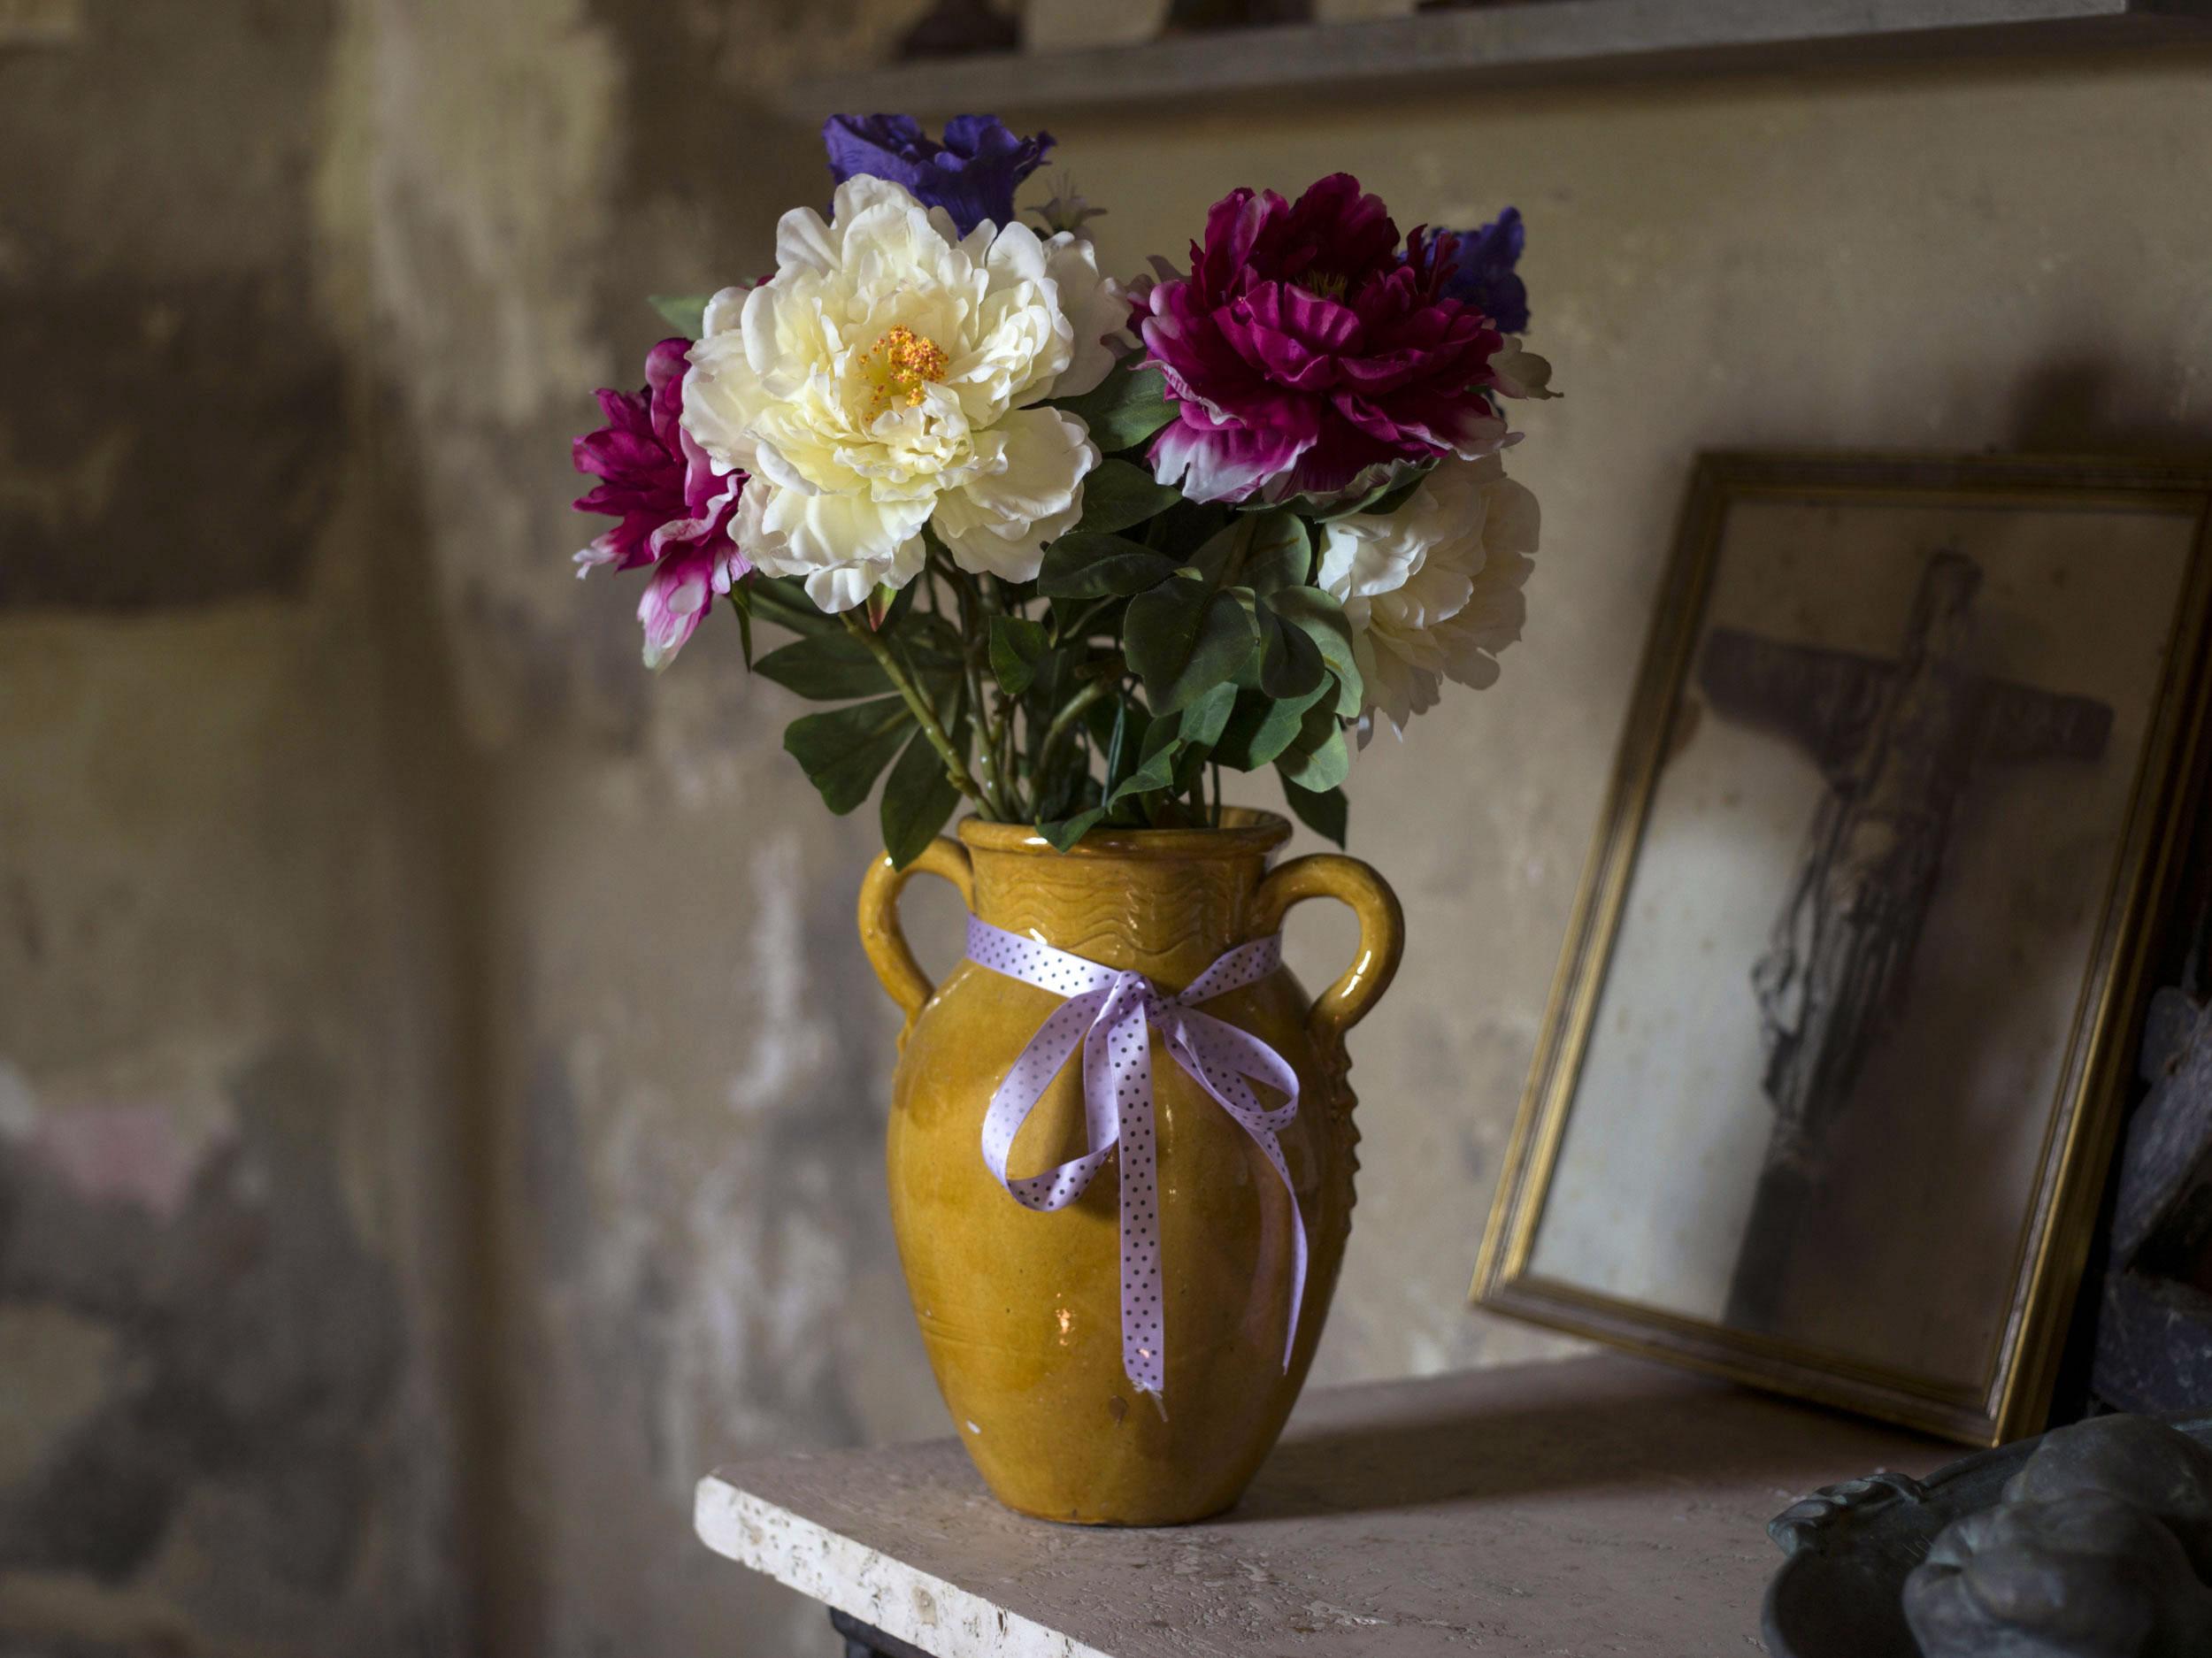 Julian-Ward-Peralta-Chapel-Flowers-Tuscany-Italy.jpg